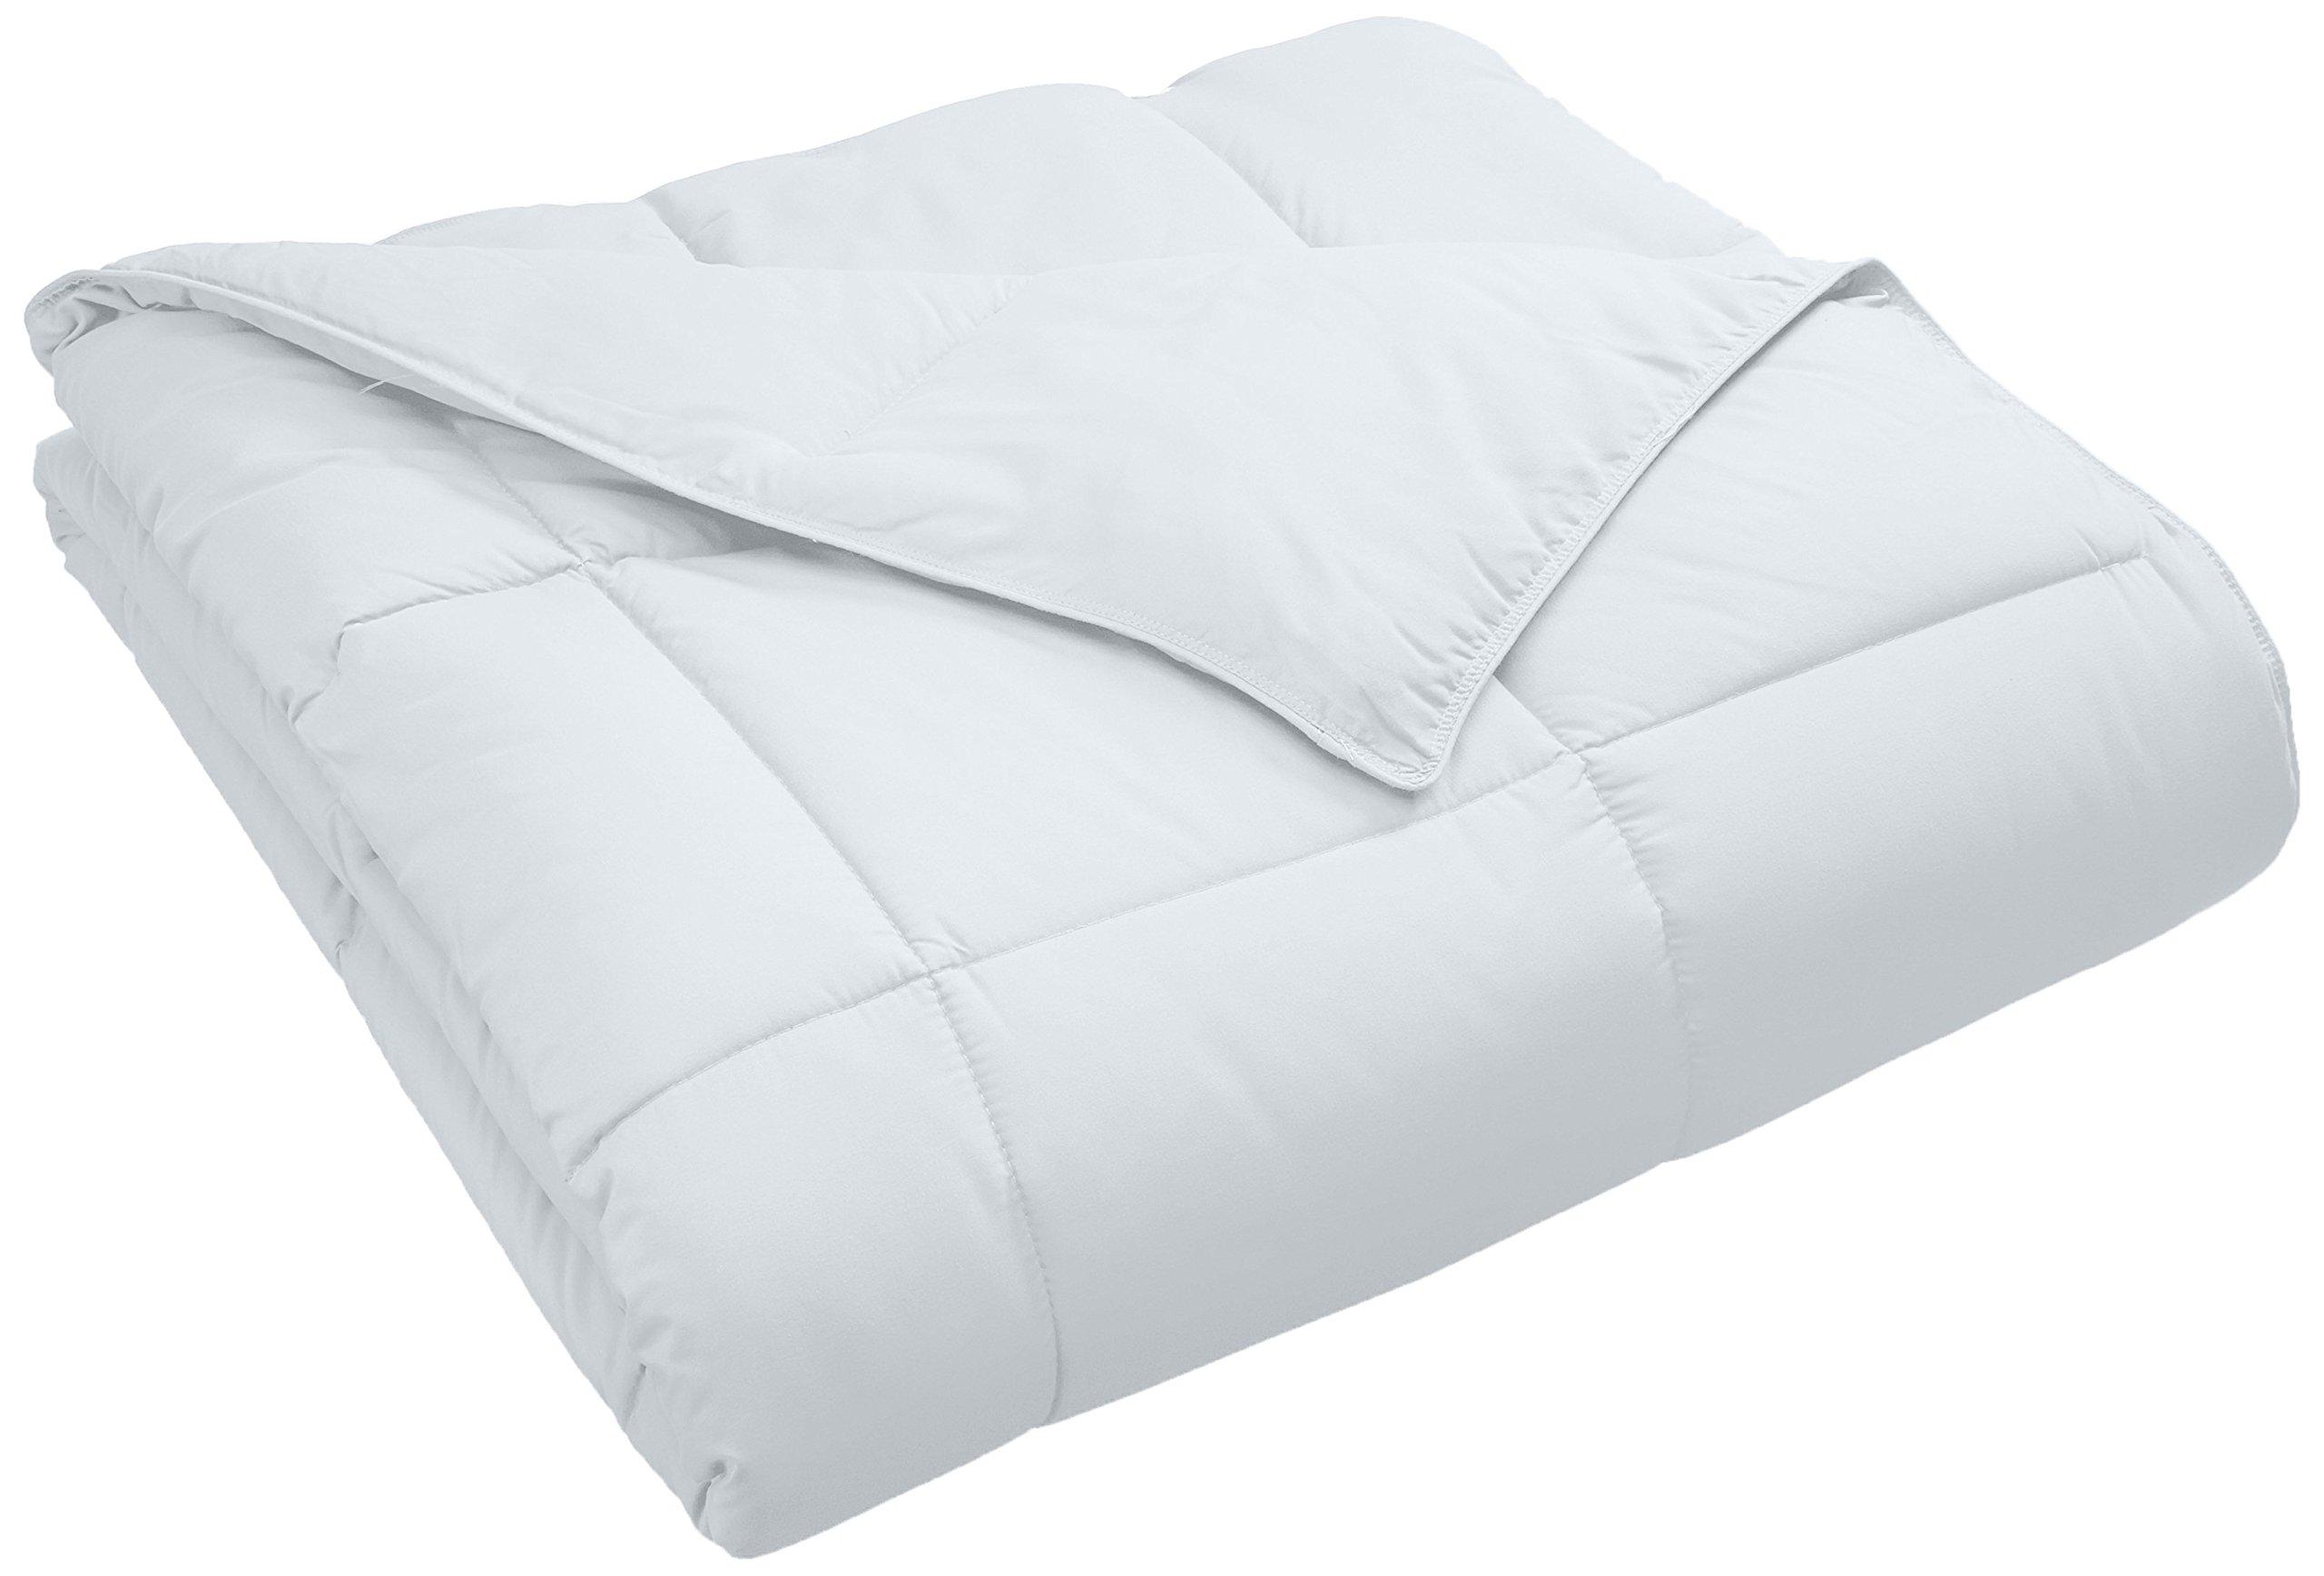 Superior Classic All-Season Down Alternative Comforter with Baffle Box Construction, Warm Hypoallergenic Filling - Twin Comforter, White